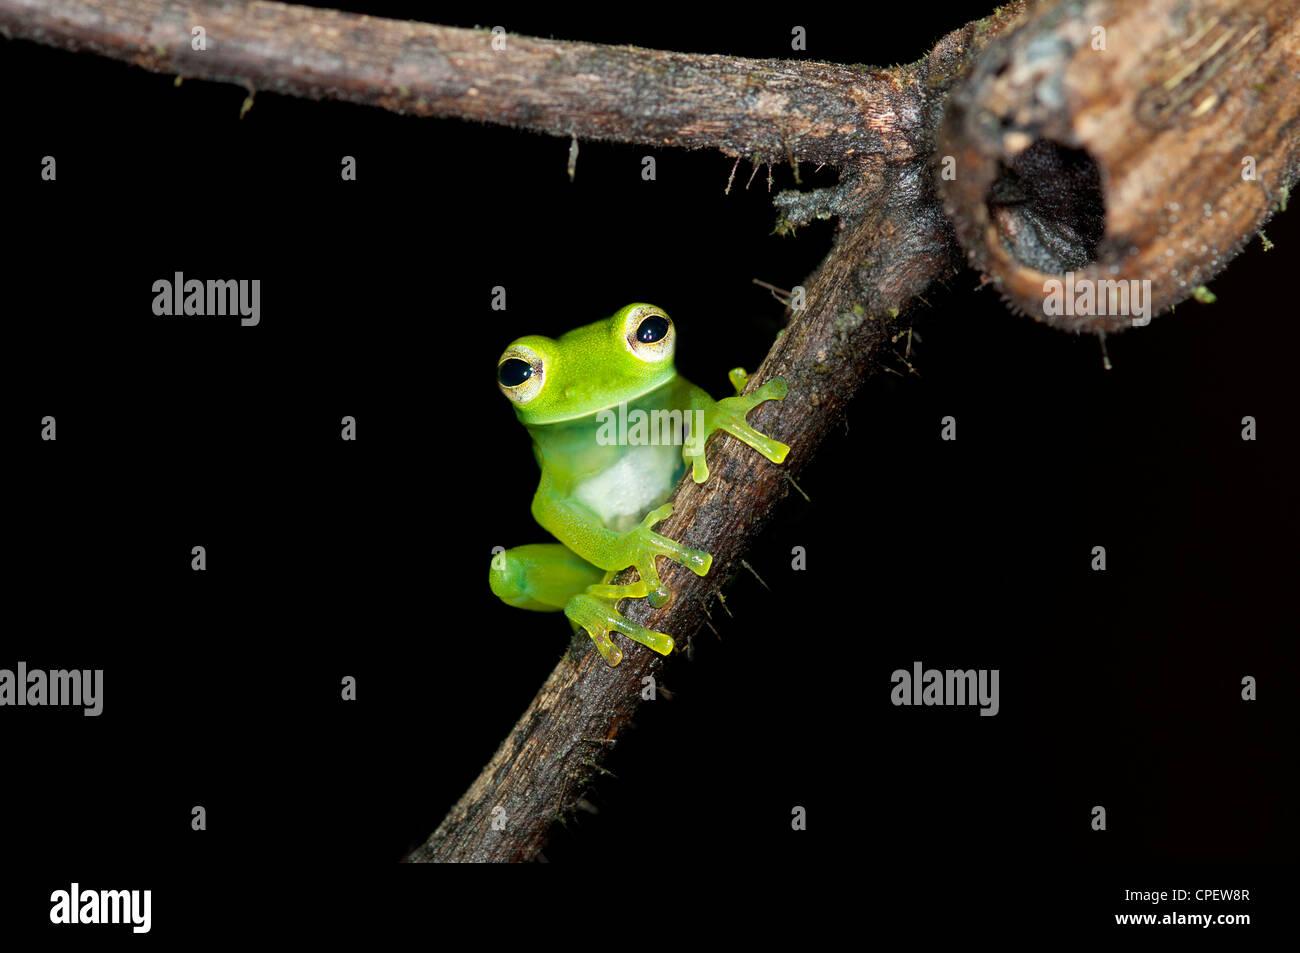 Glas frog Cochranella midas, sitting on a branch in the Tiputini rain forest, Yasuni National Park, Ecuador - Stock Image